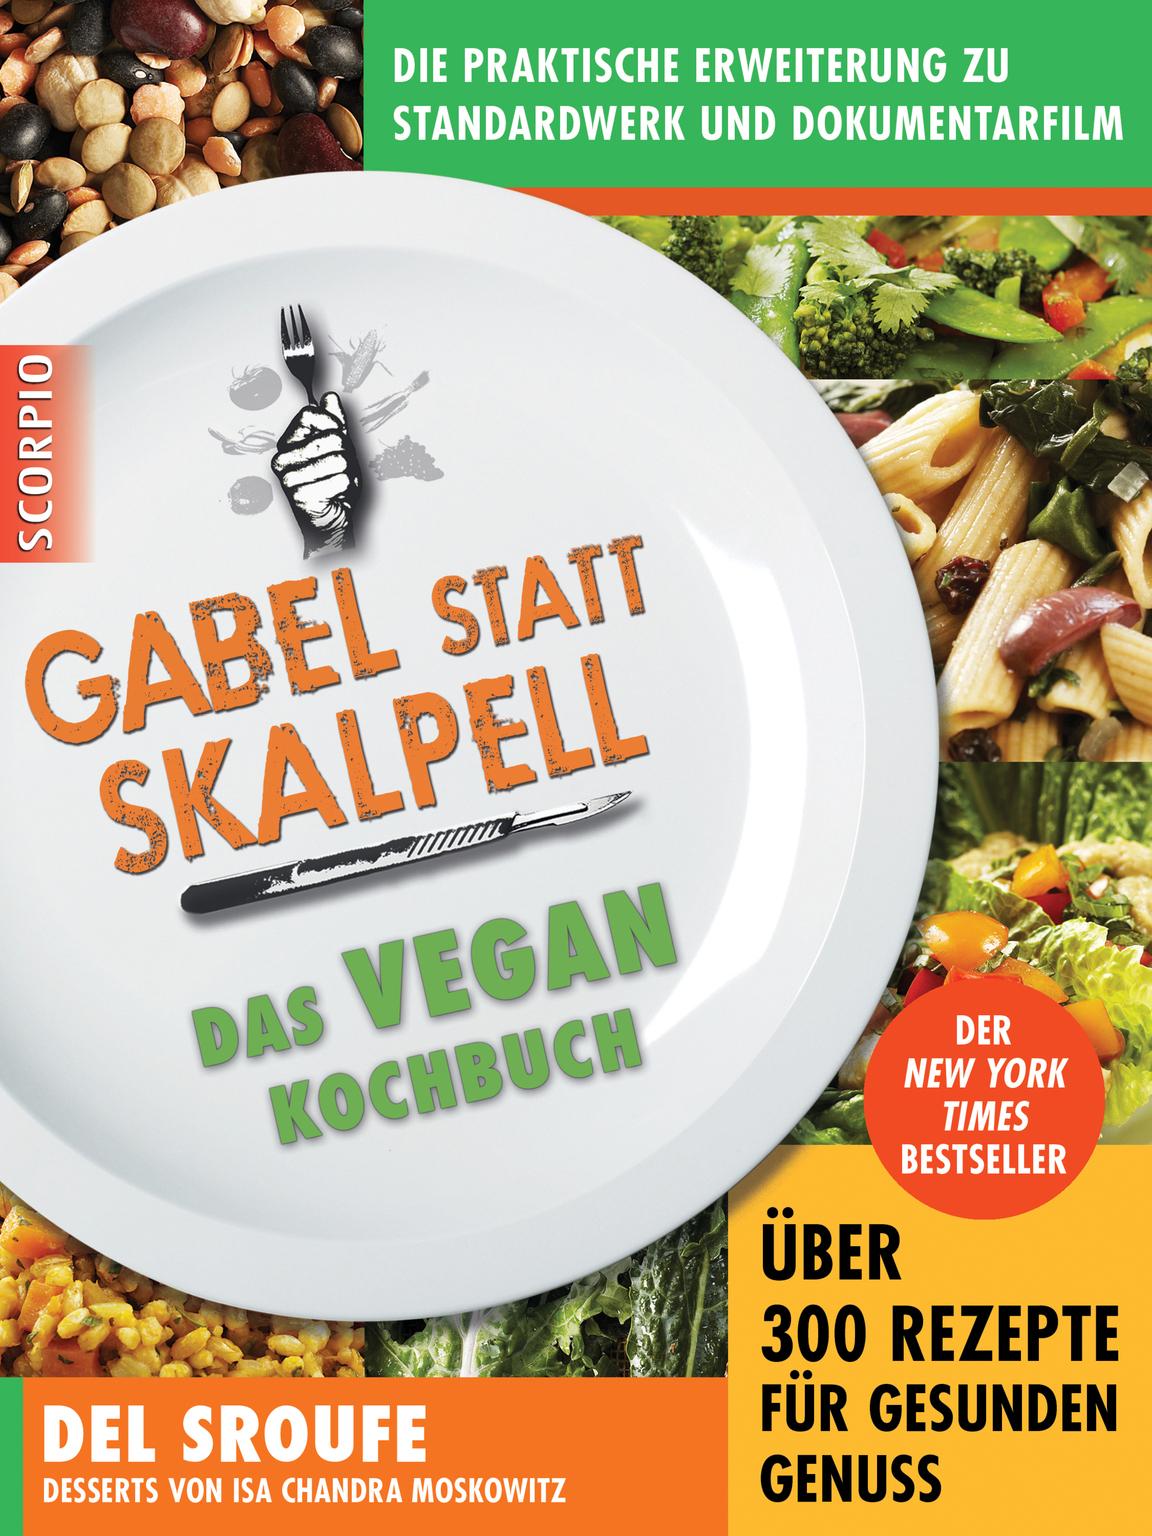 Gabel statt Skalpell: Das Vegan-Kochbuch - Del Sroufe